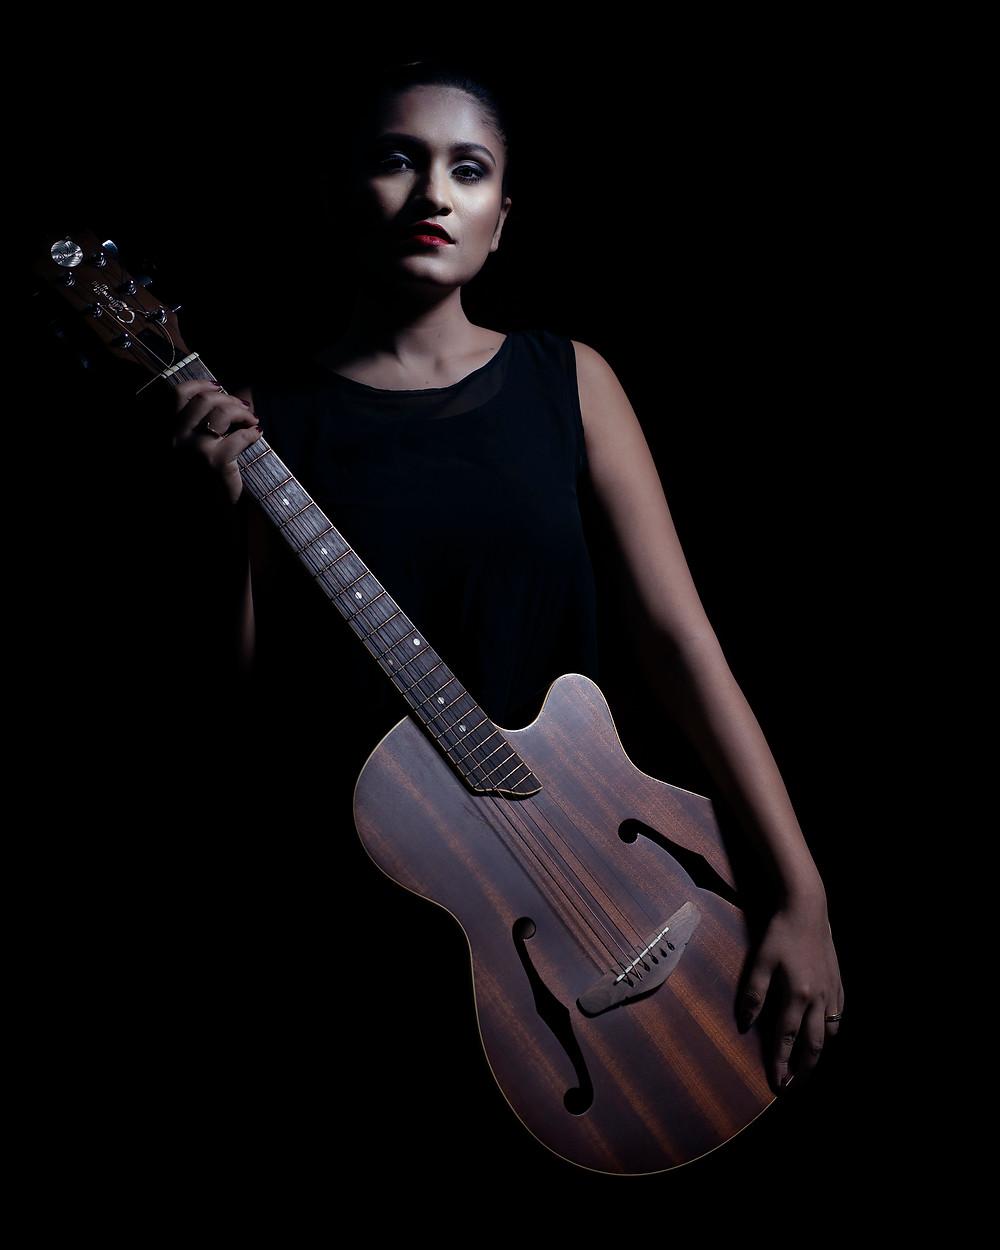 Model posing with guitar